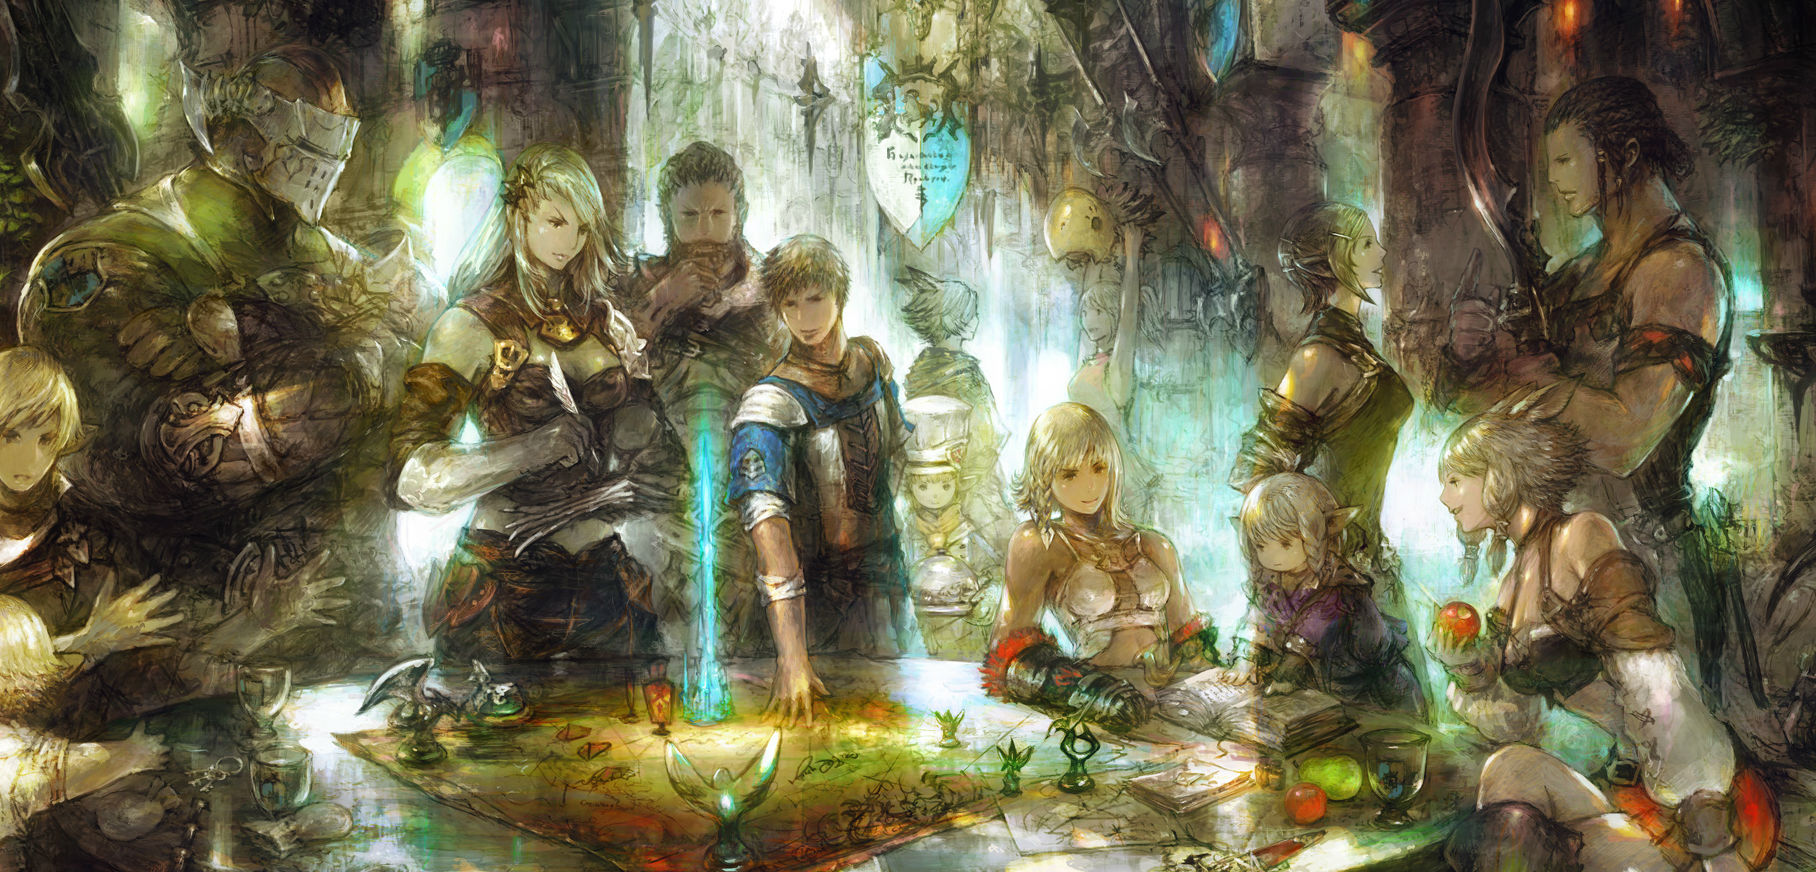 Final-Fantasy-XIV-Artwork-01